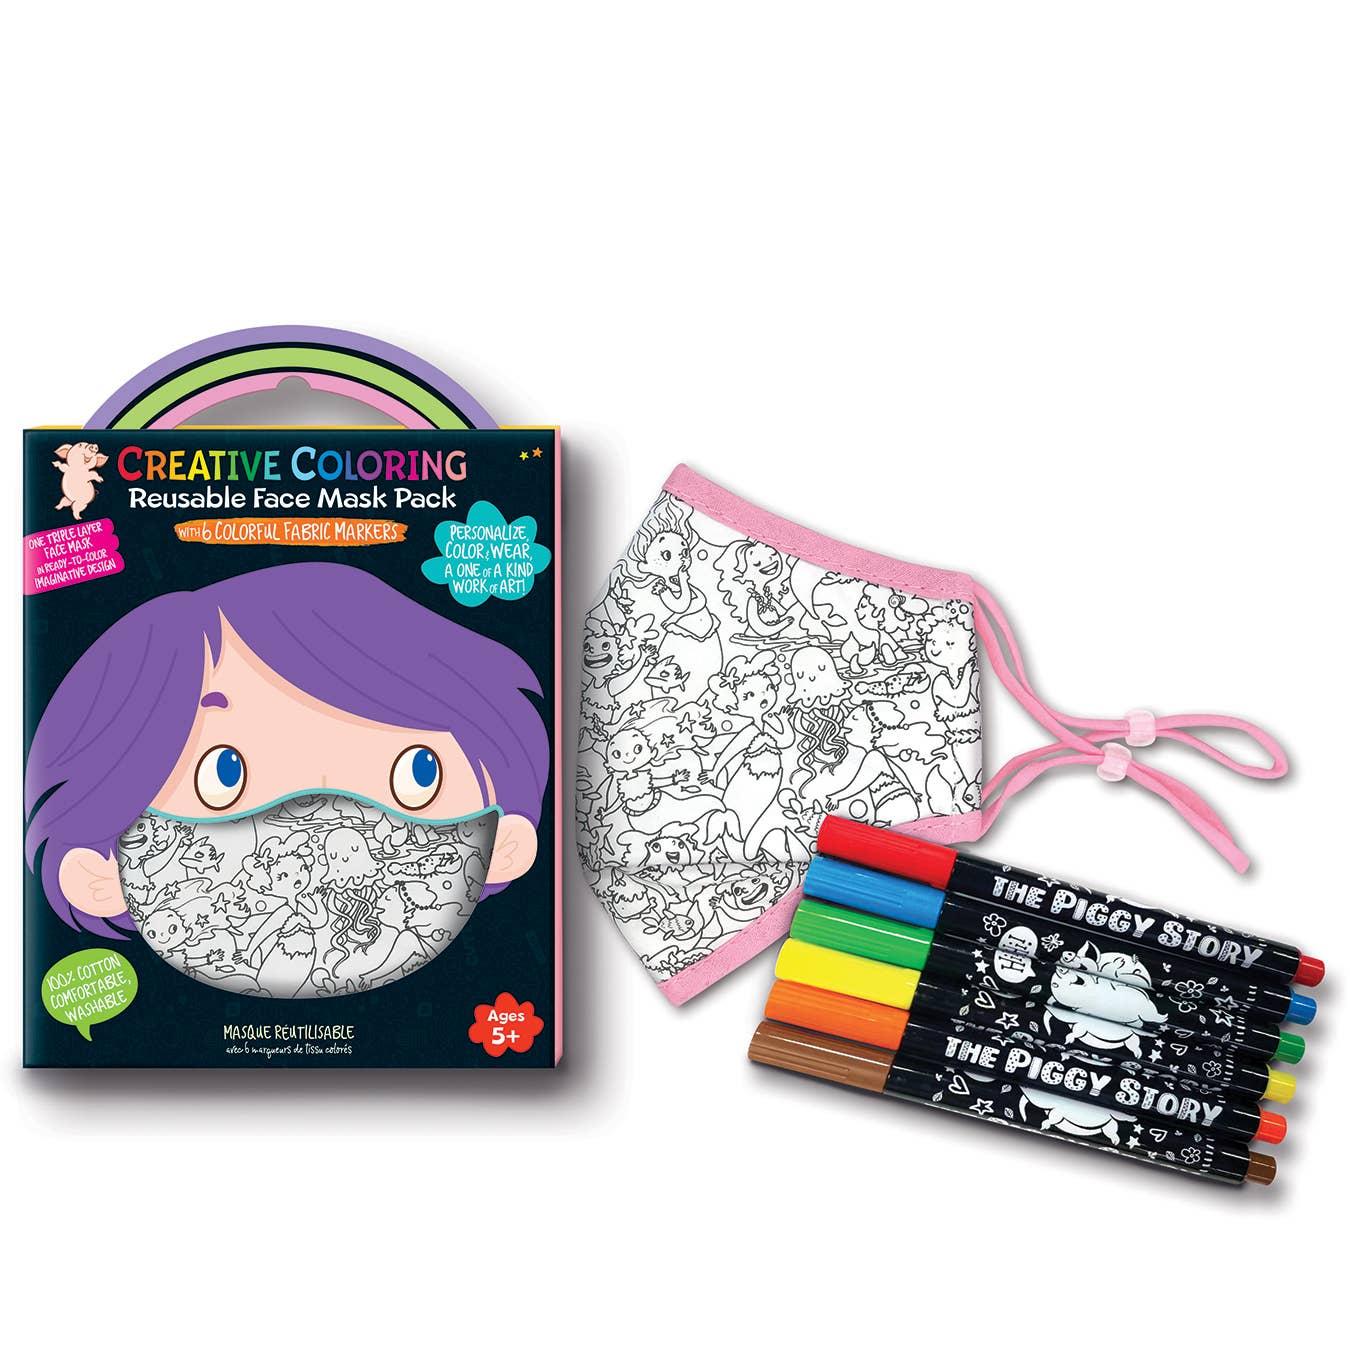 Creative Coloring Face Mask Pack- Magical Mermaids   Trada Marketplace